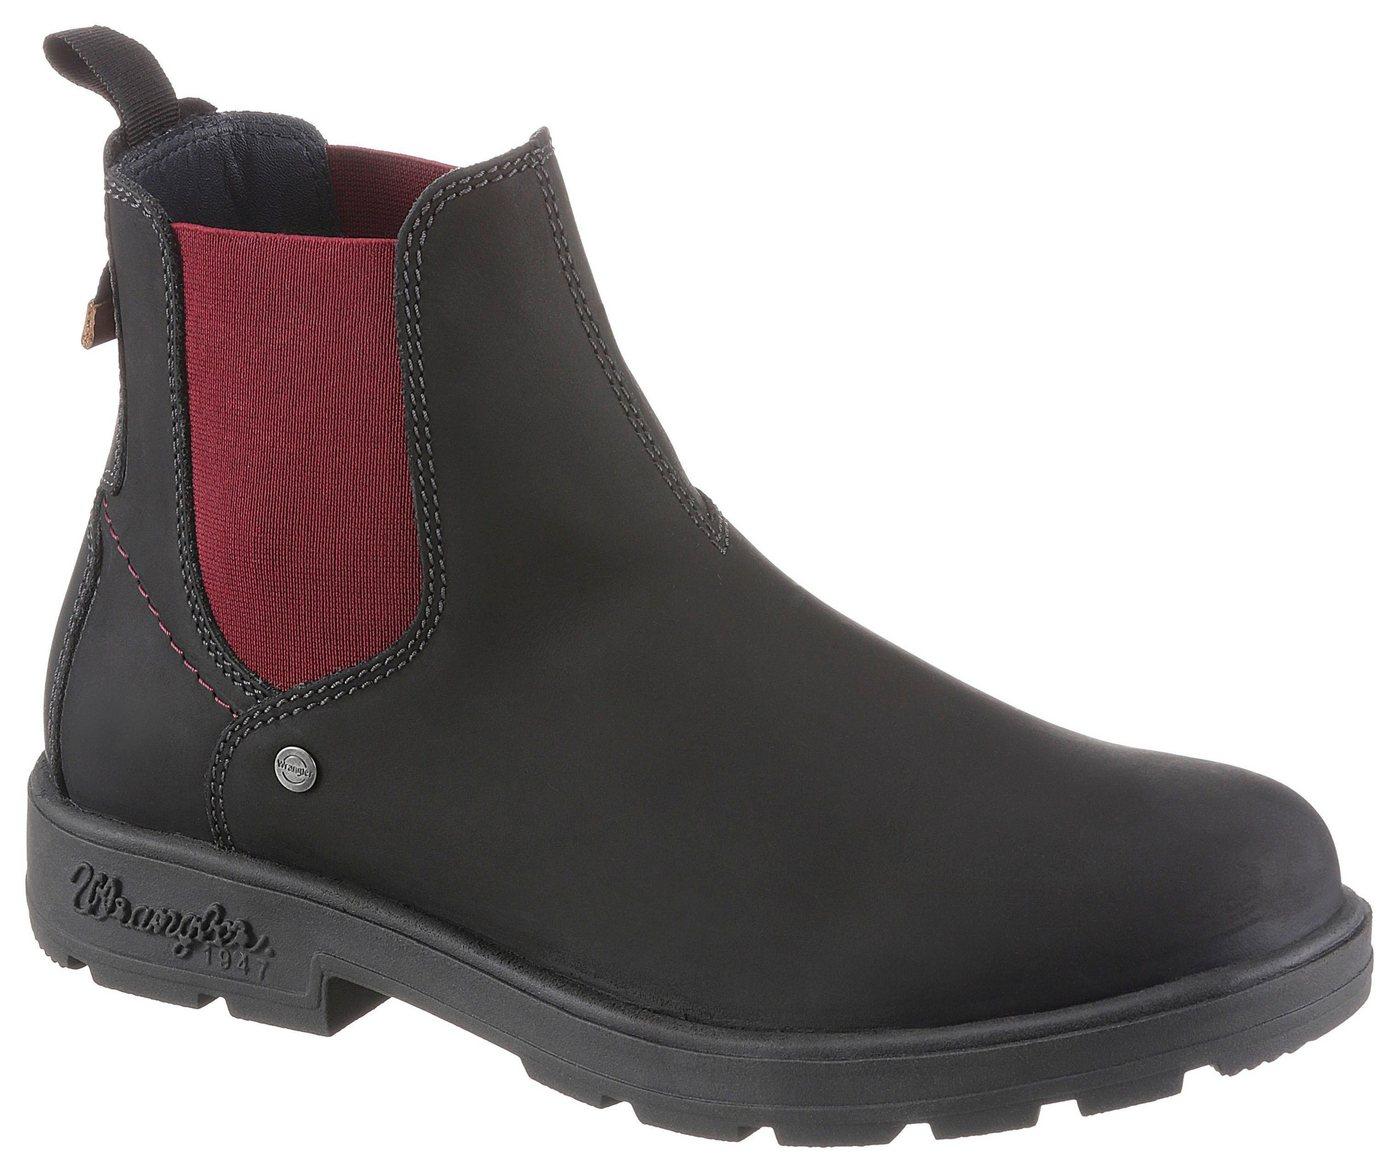 Wrangler »Buddy« Chelseaboots mit kontrastfarbenem Stretcheinsatz | Schuhe > Boots > Chelsea-Boots | Schwarz | Wrangler